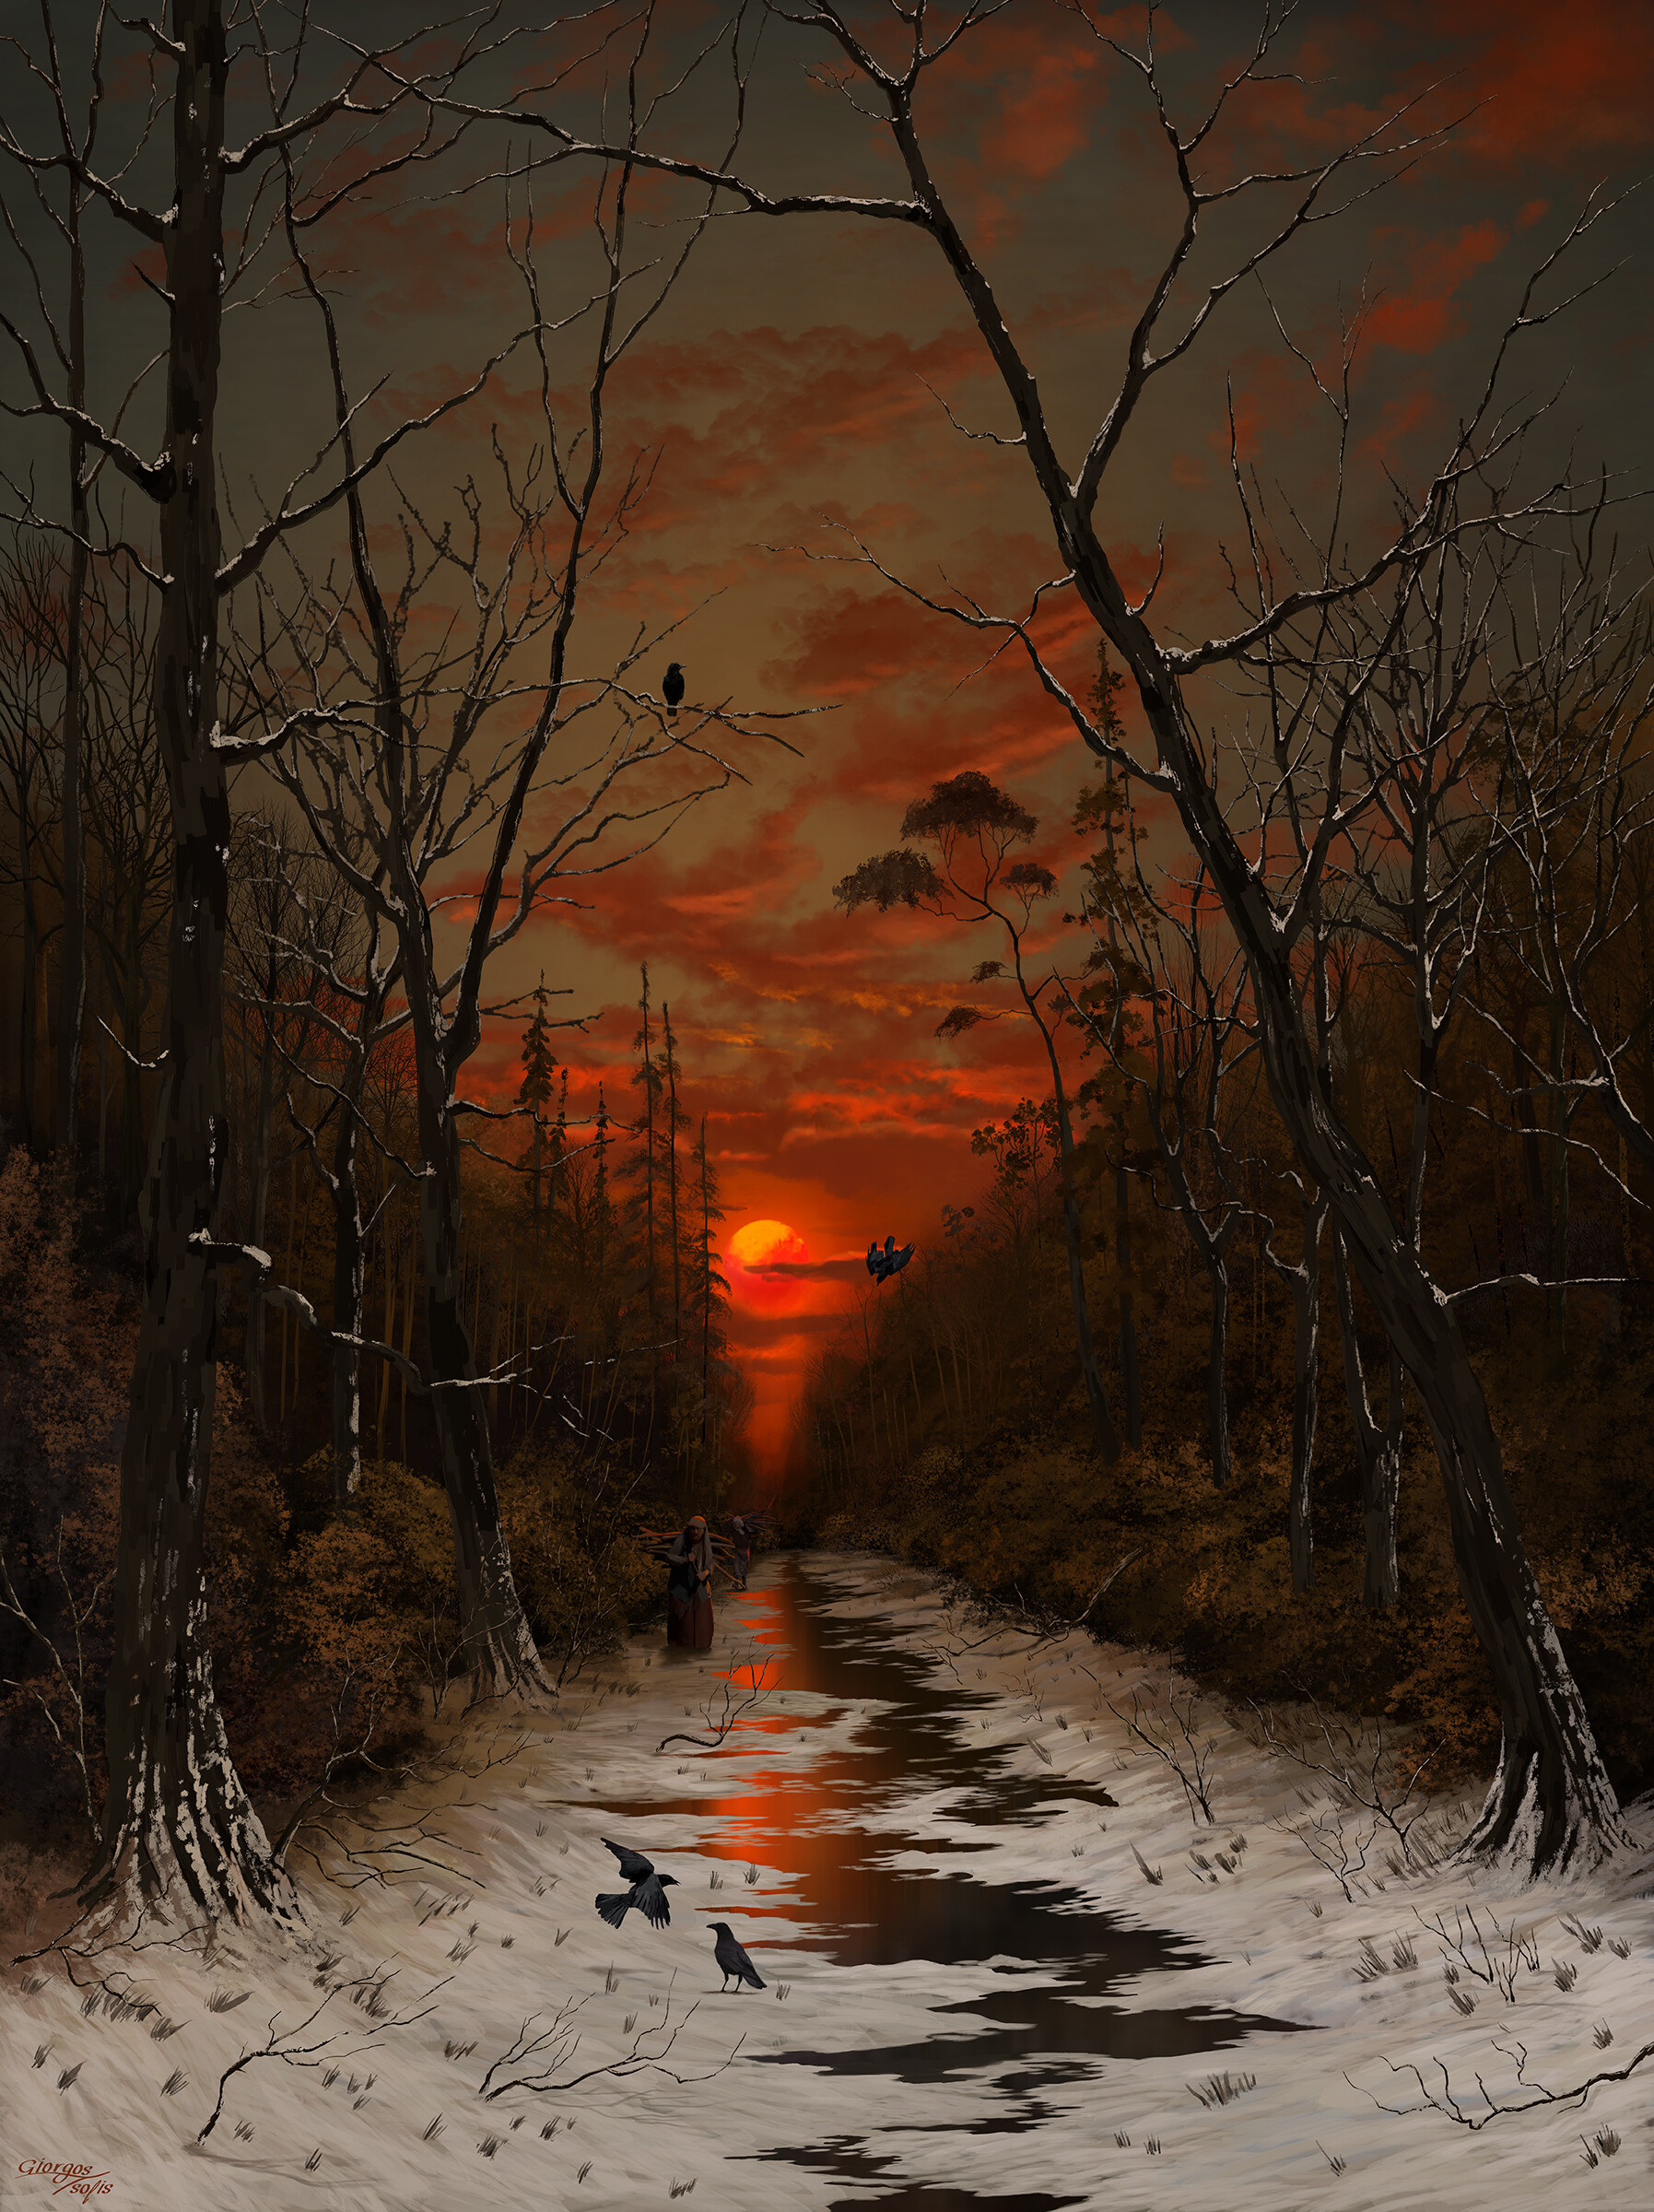 General 1795x2400 portrait display sunset digital art digital painting tree bark red sky fan art artwork Giorgos Tsolis